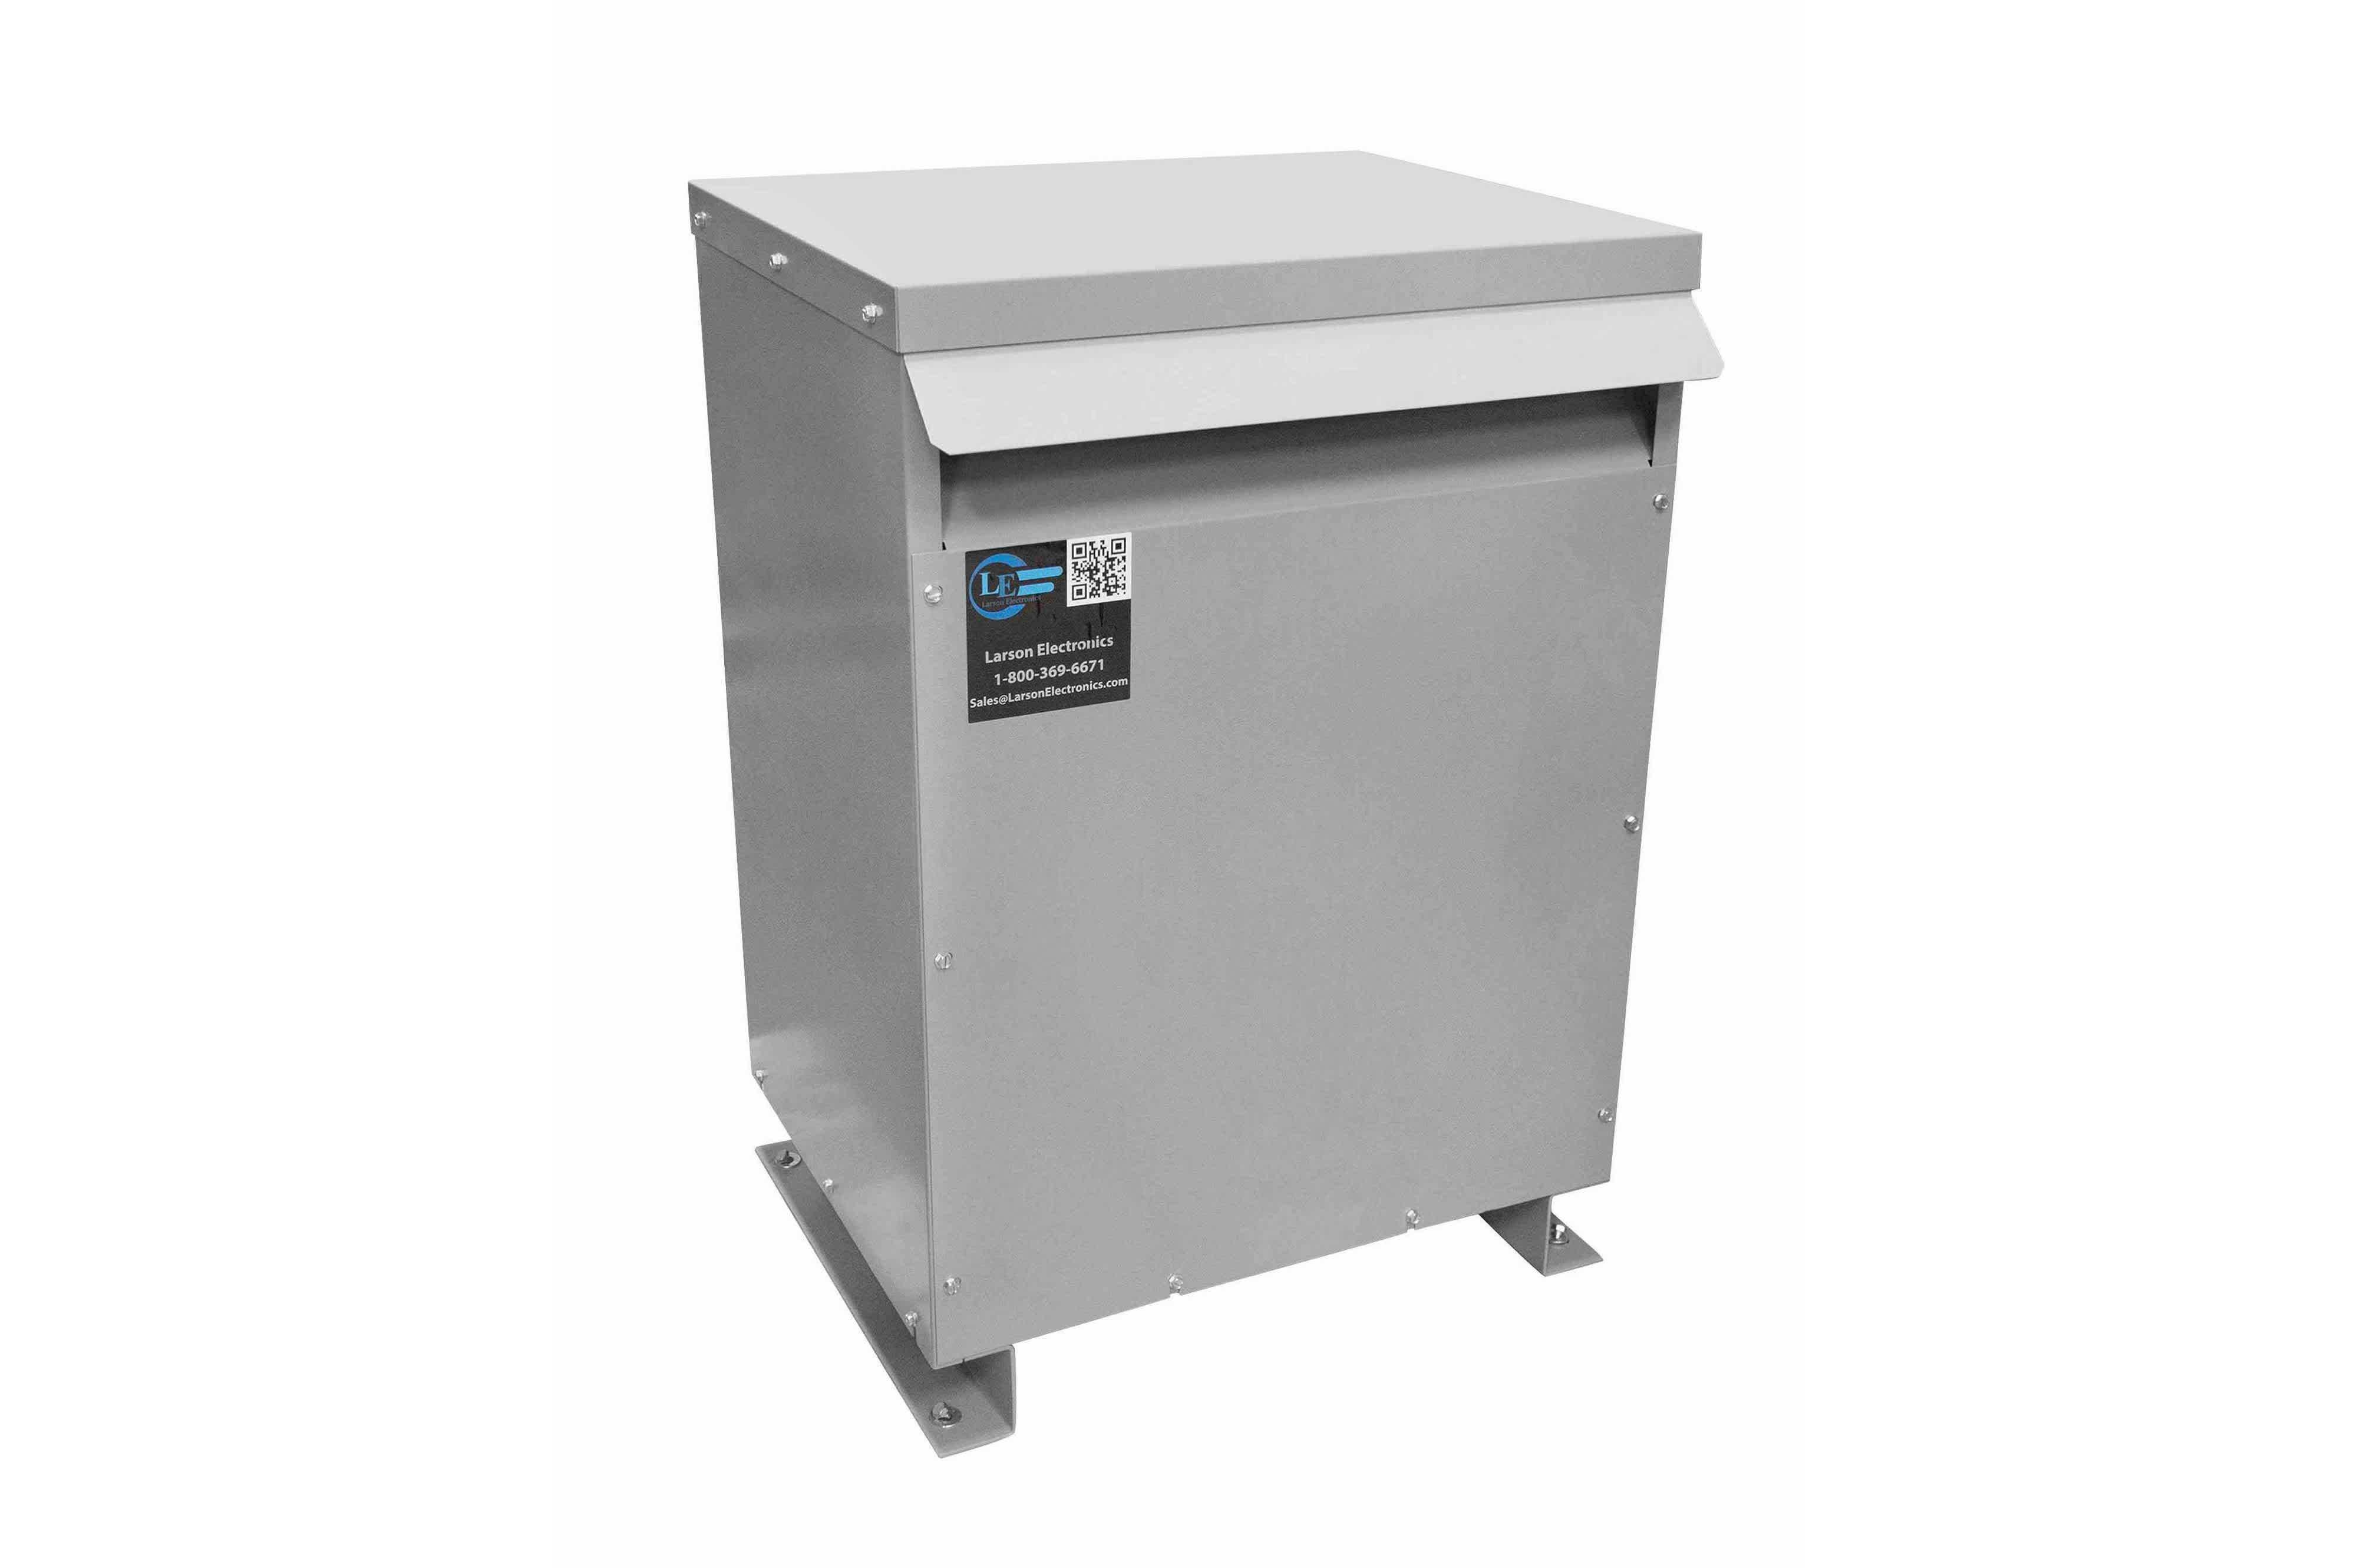 15 kVA 3PH Isolation Transformer, 480V Wye Primary, 240V/120 Delta Secondary, N3R, Ventilated, 60 Hz